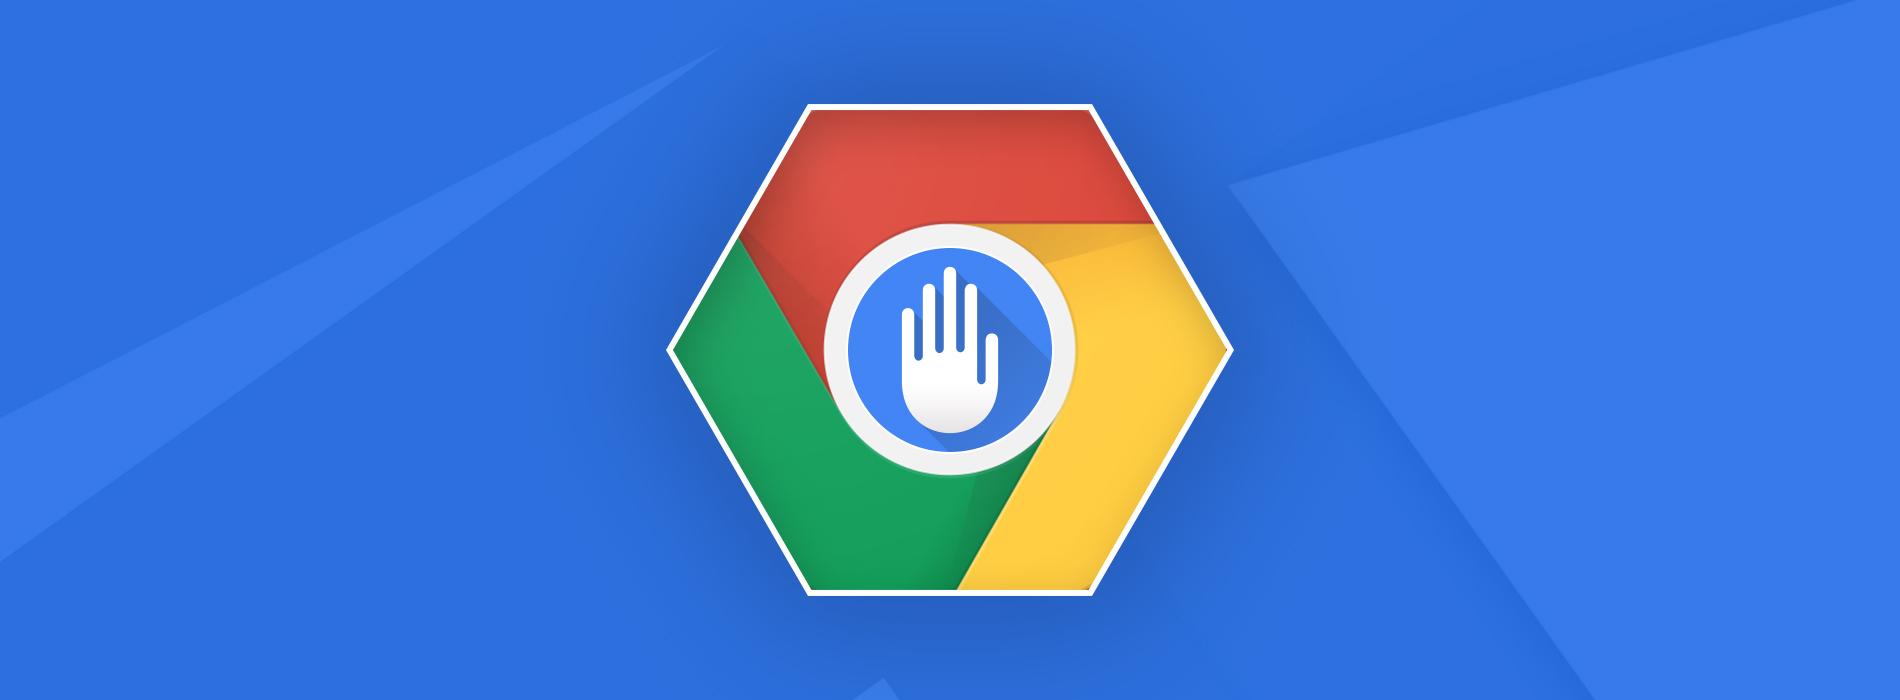 How Does Google Chrome's New Ad Blocker Work?